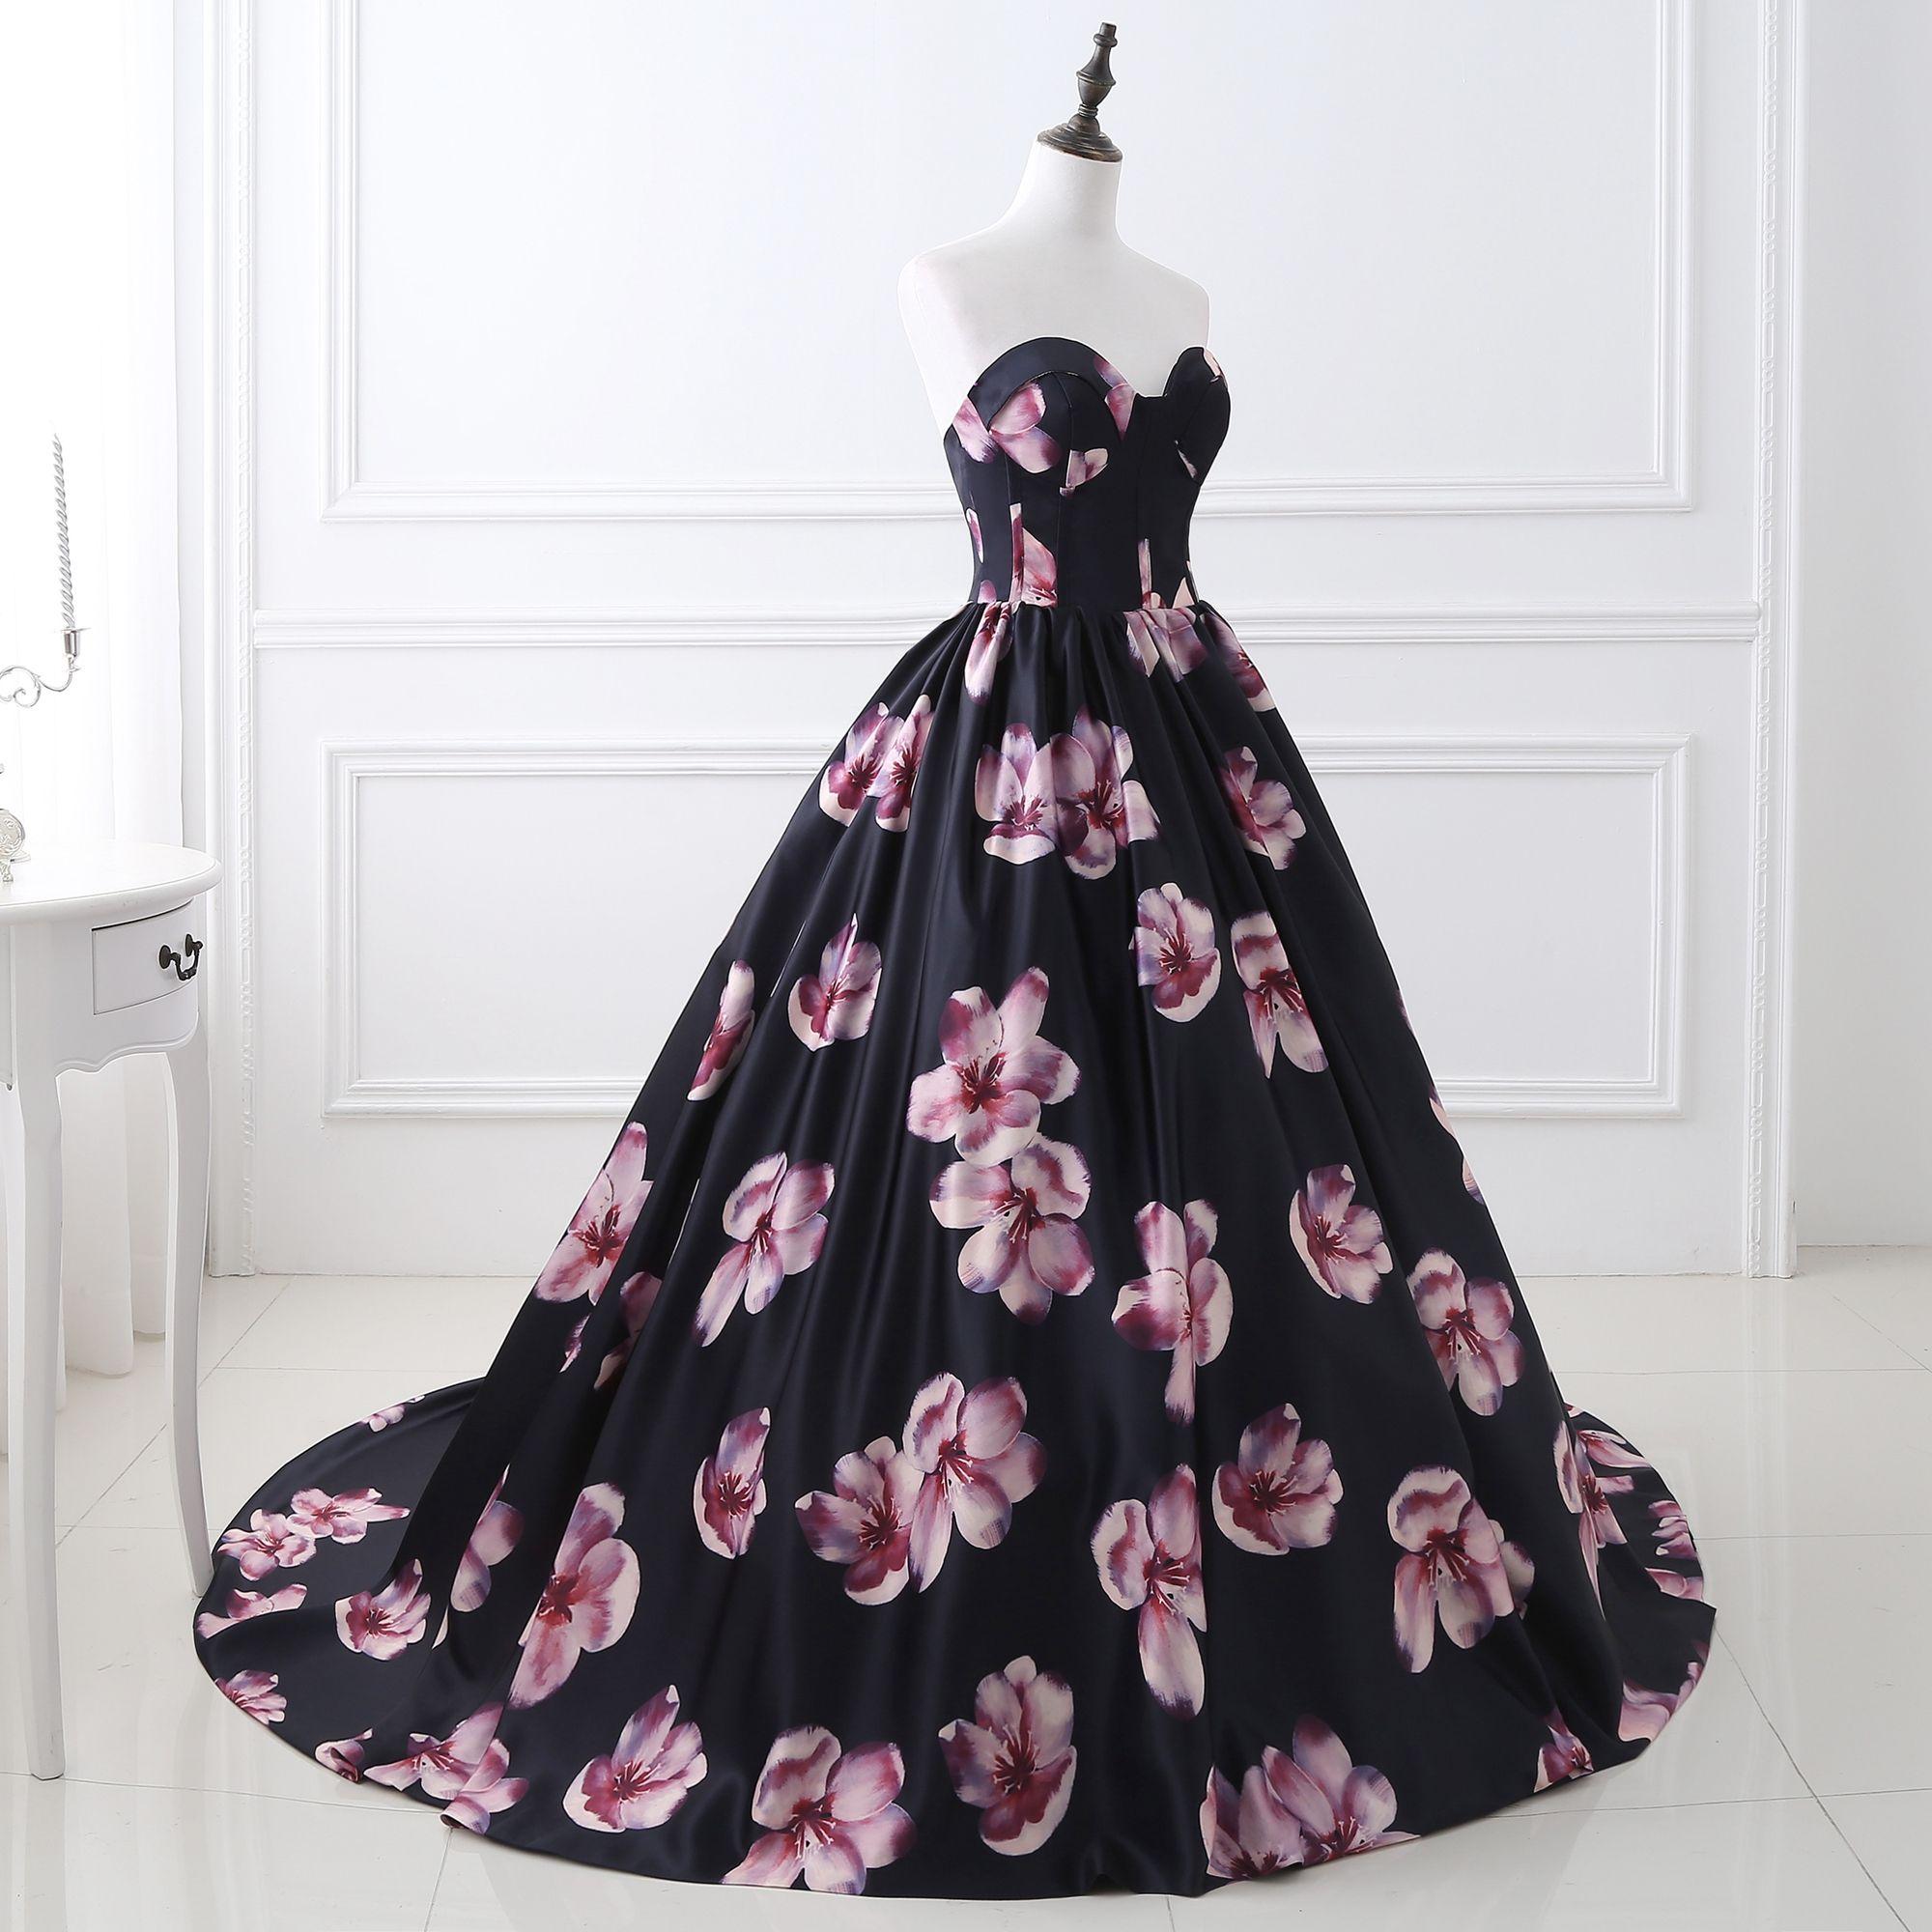 Luxury Print Evening Dresses vestido longo festa Dress Formal Arabic Evening Gowns Strapless Sweetheart Ball Gown Print Prom Dresses